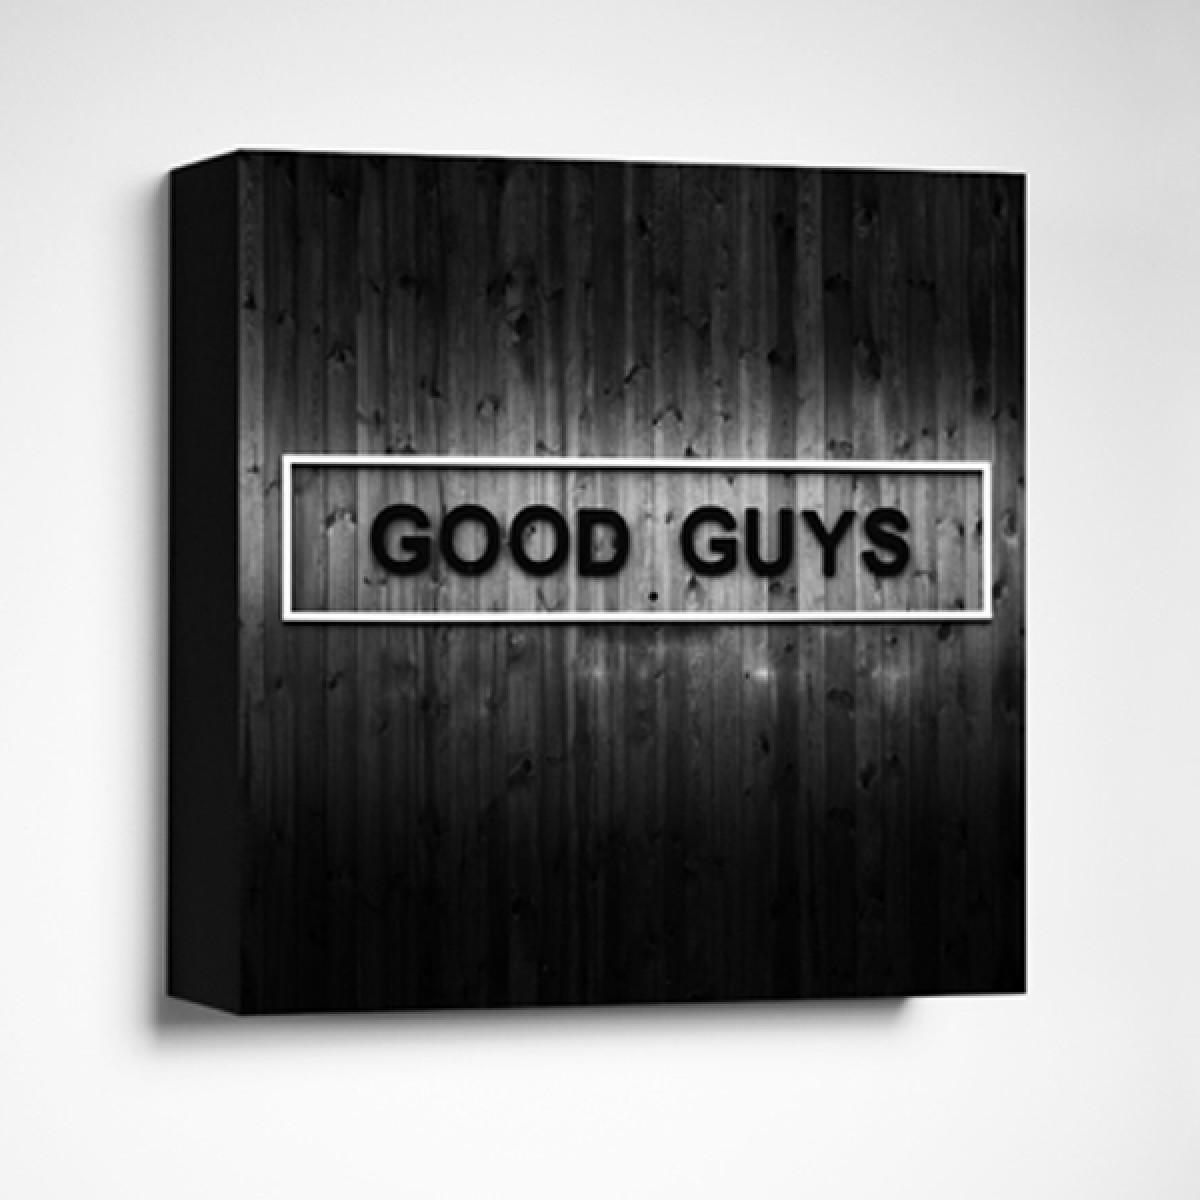 FrankfurterBubb GOOD GUYSLimited Edition schwarz-weißFoto-Kachel